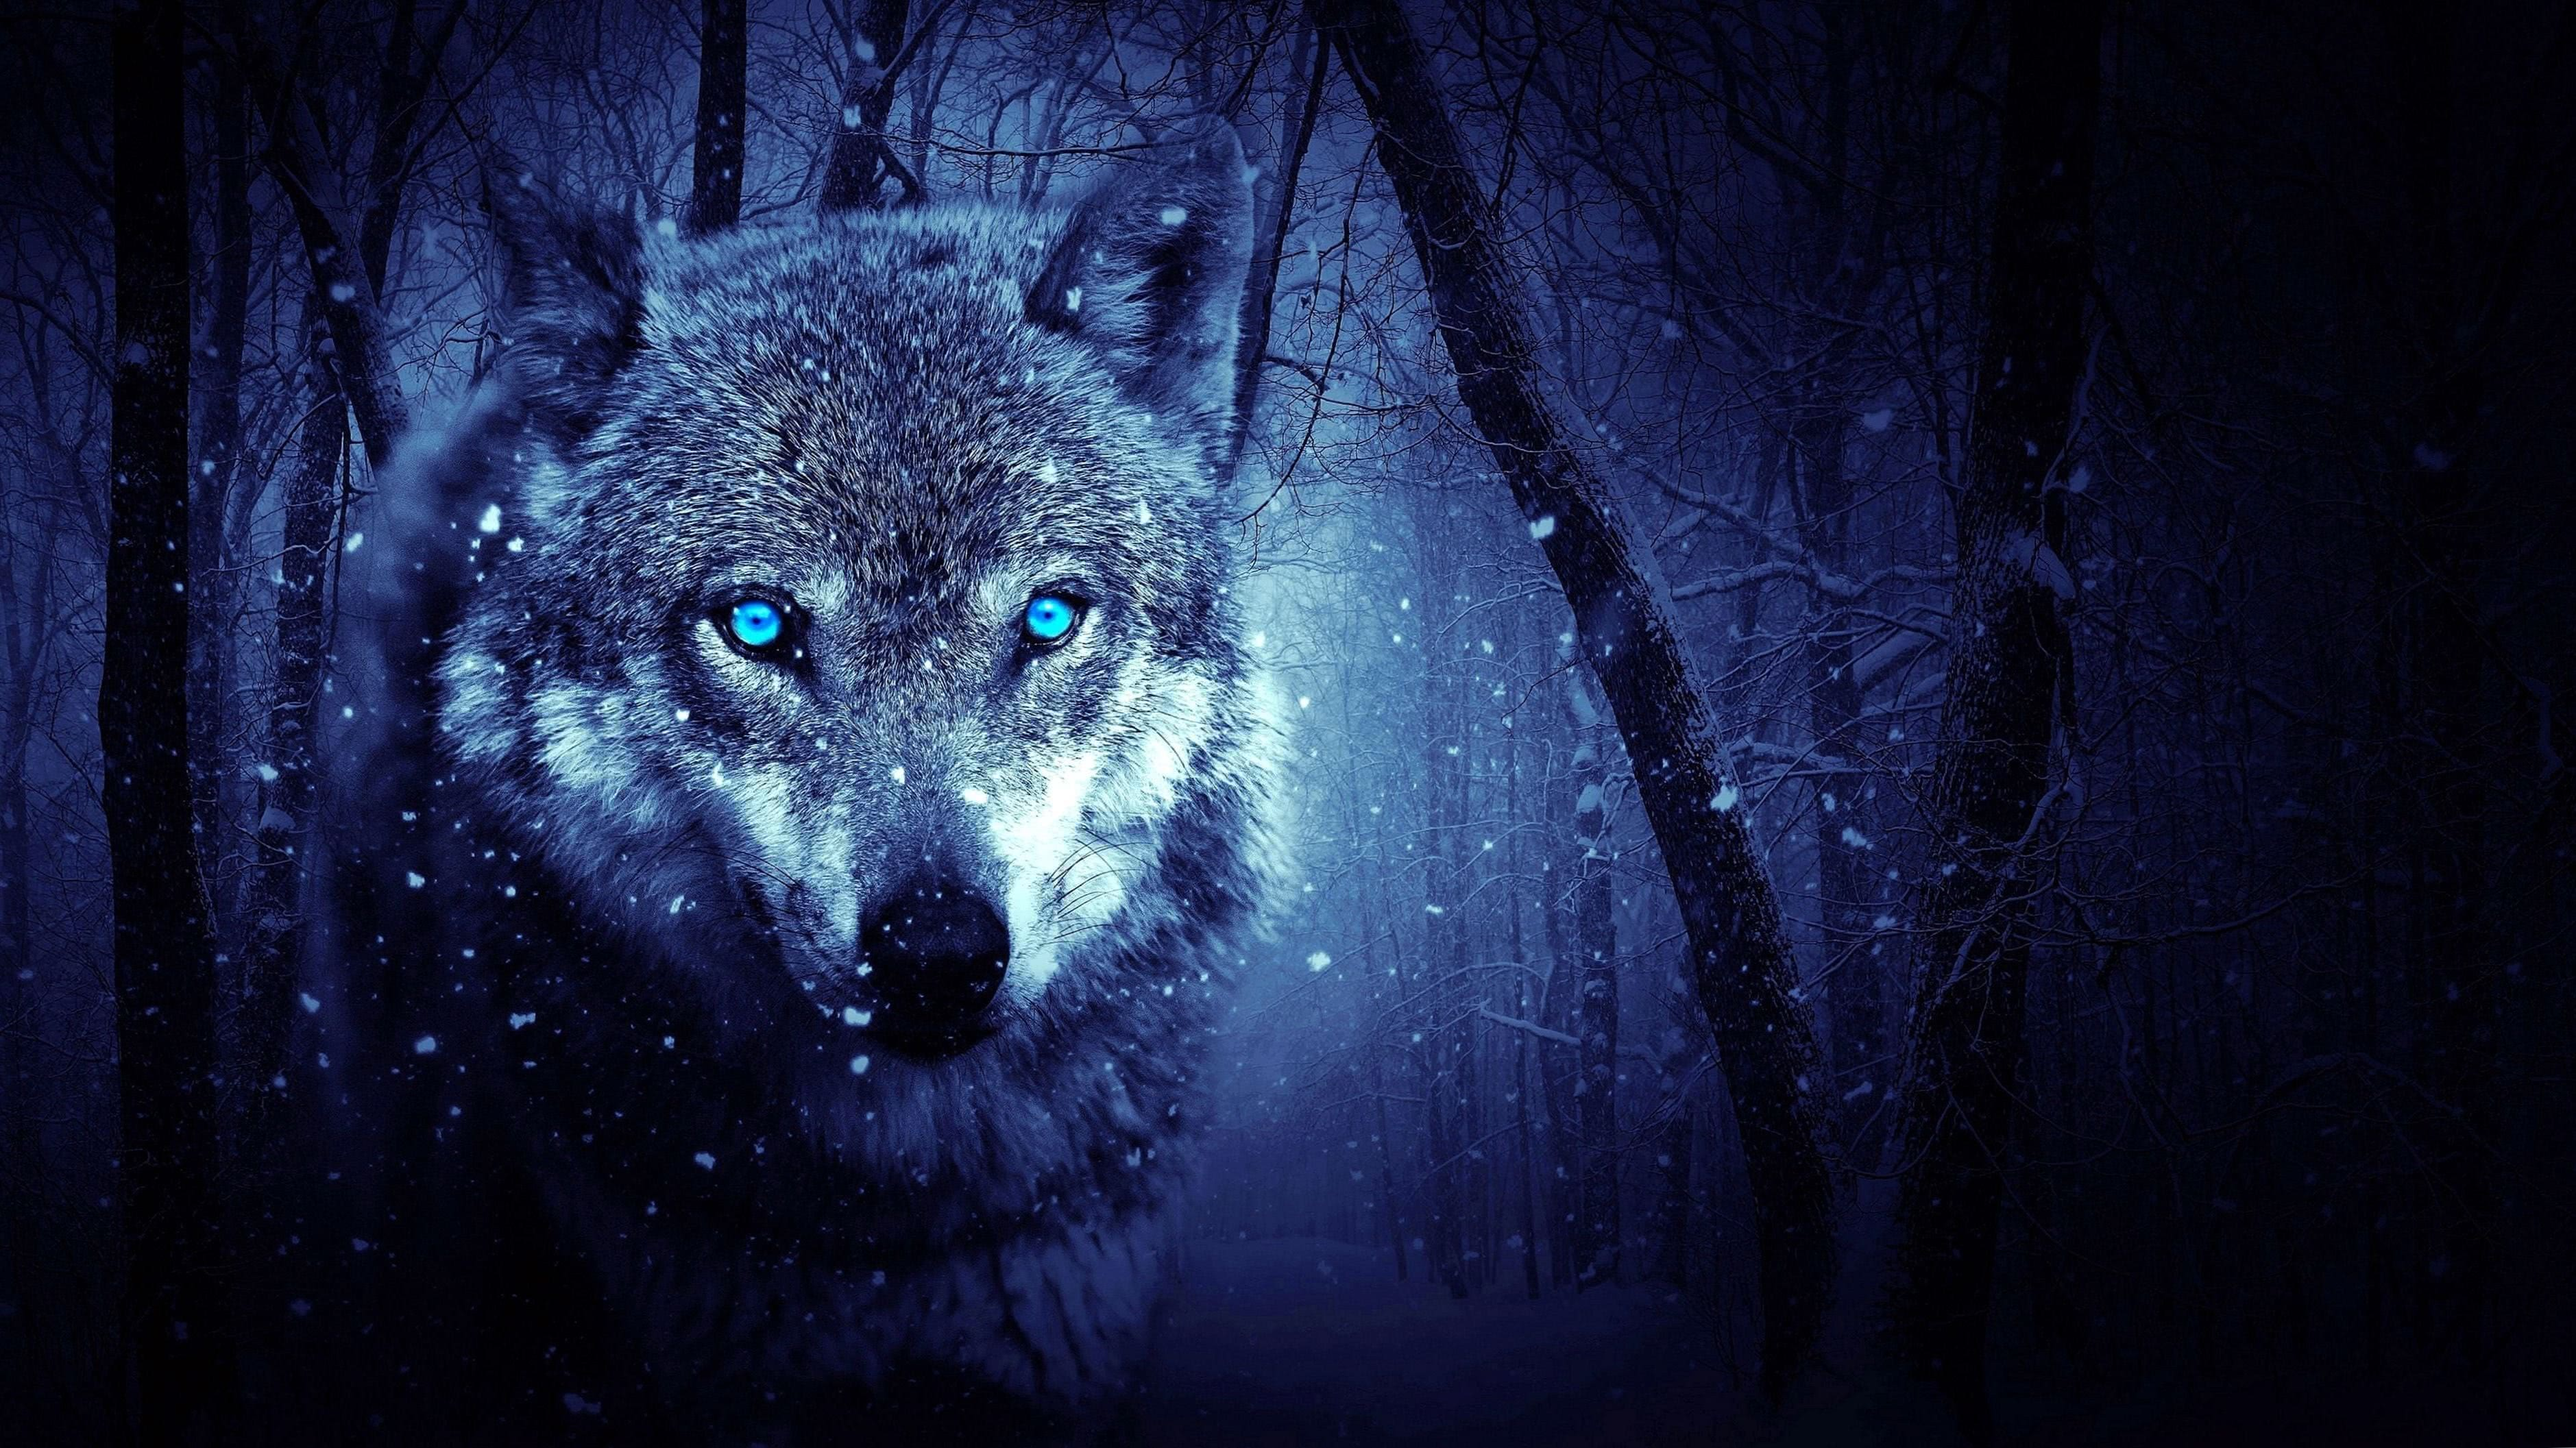 Wolf Eye Wallpaper 4K